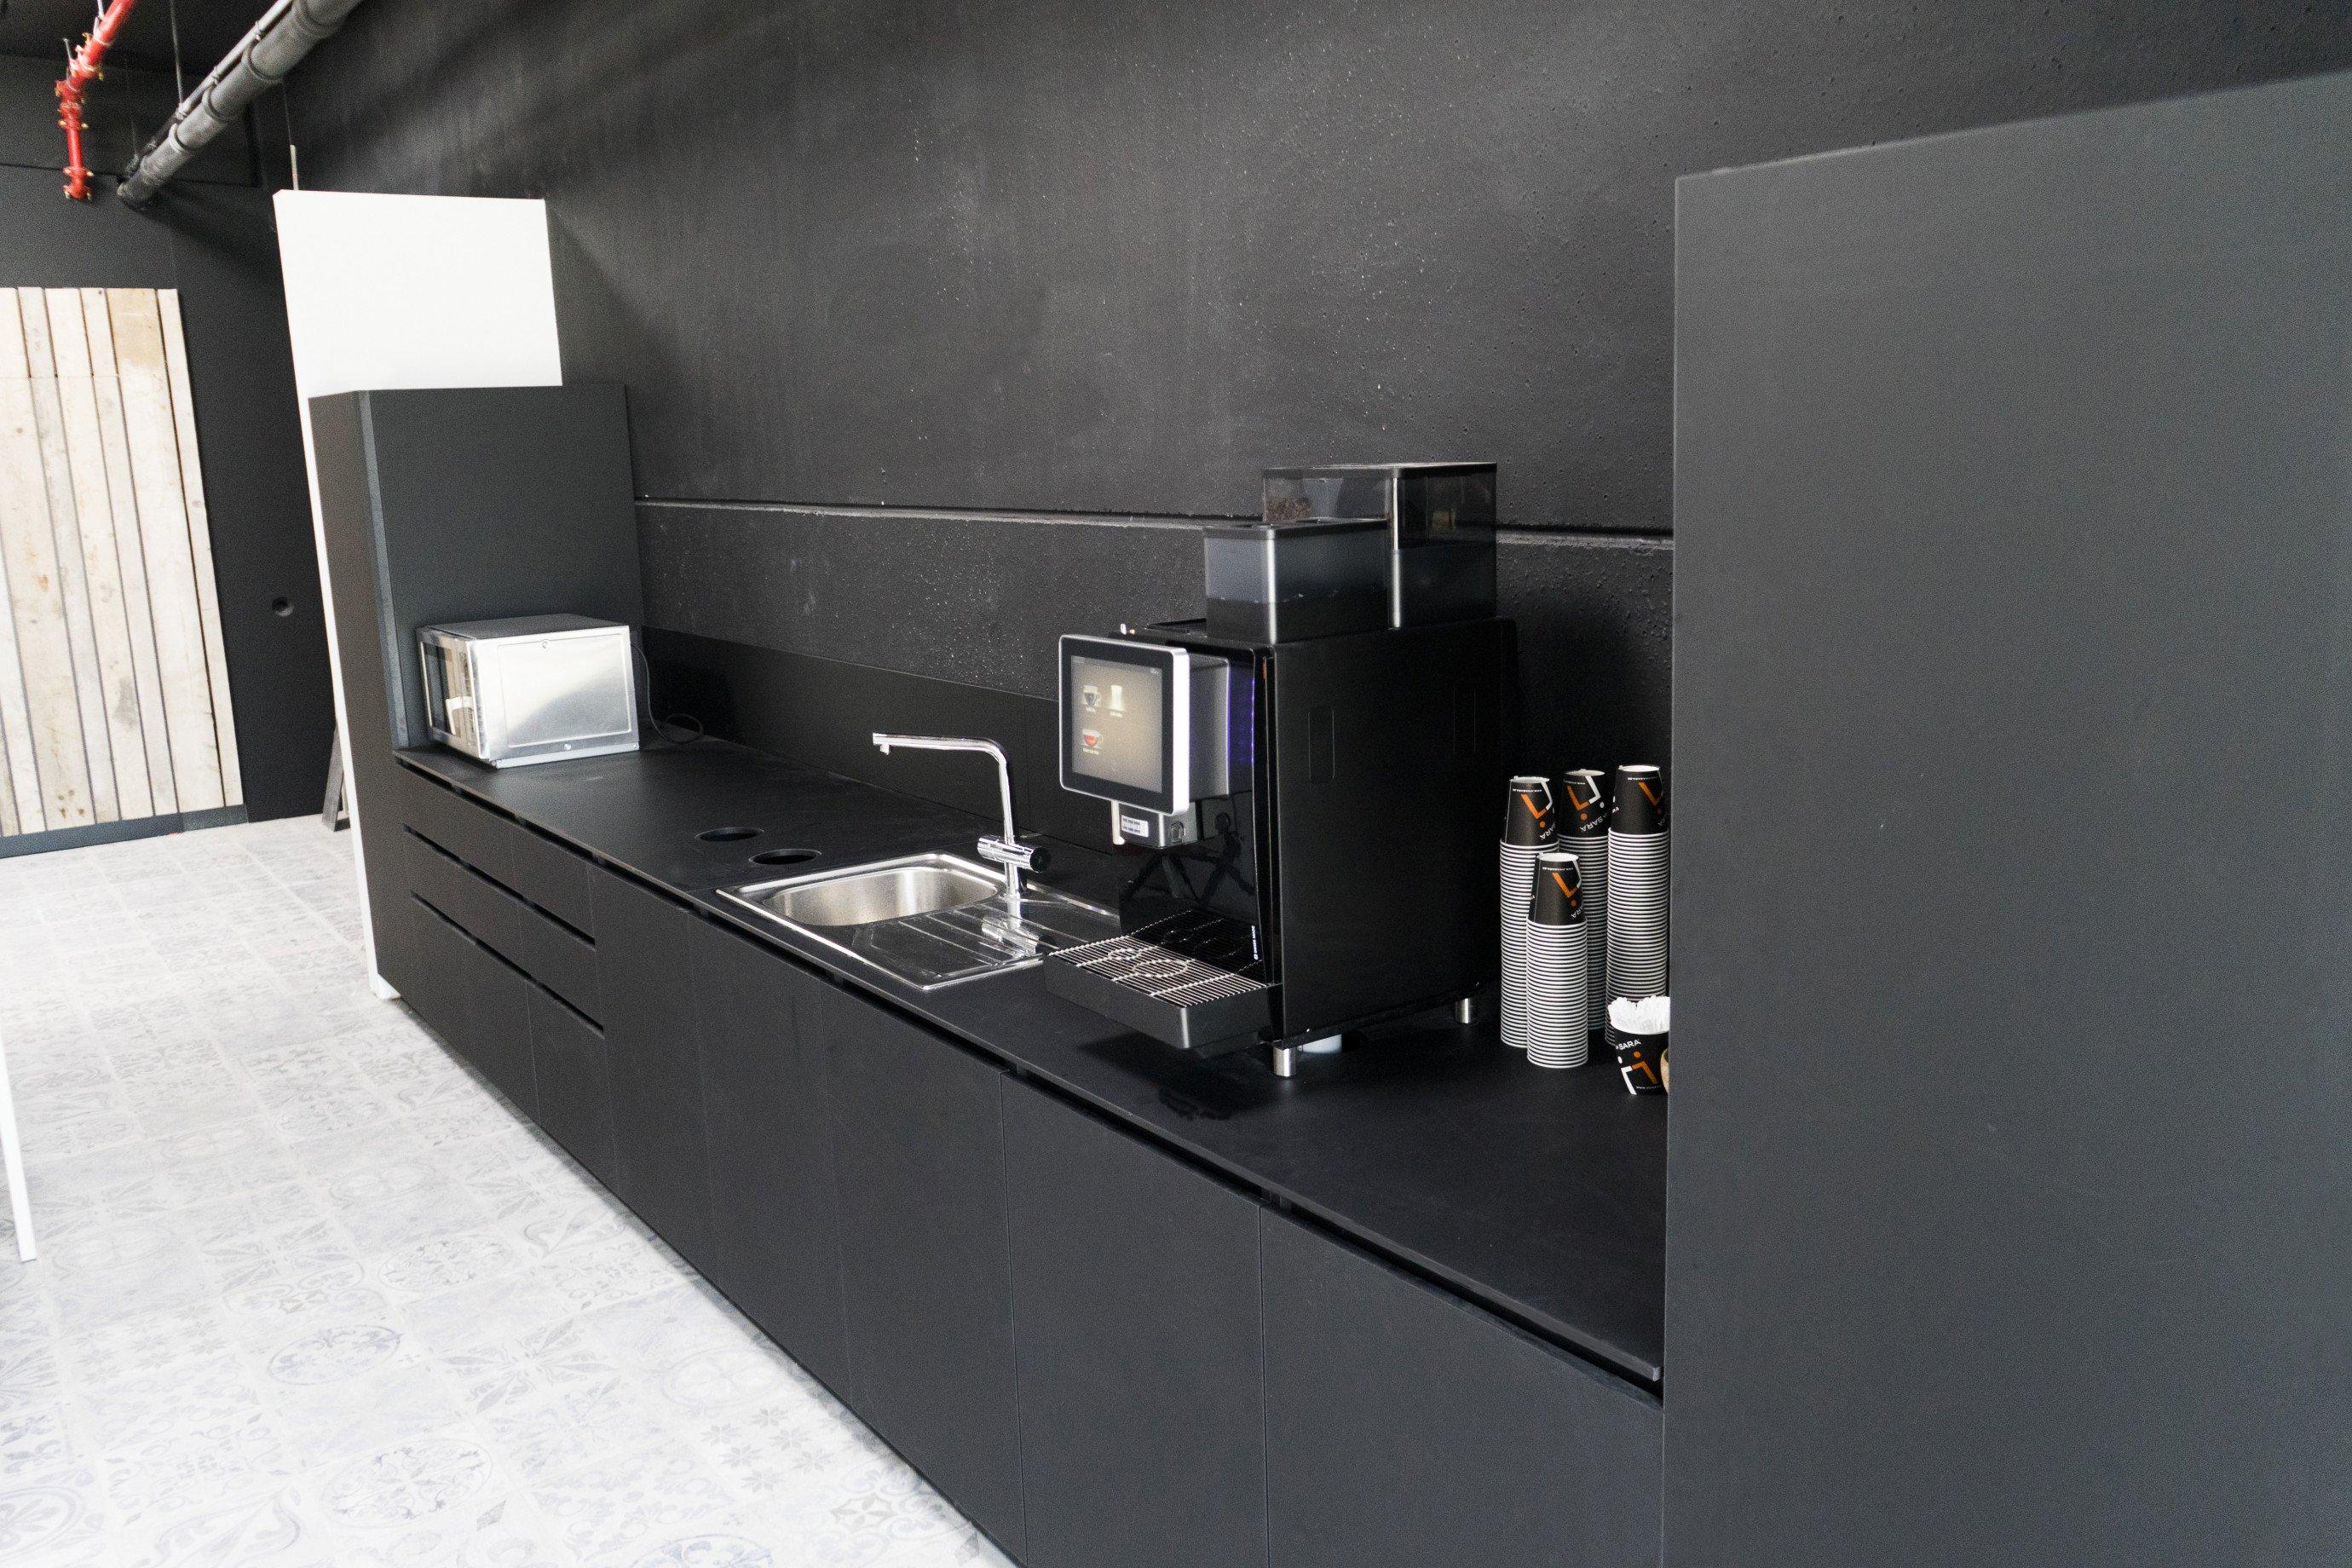 Laboratoriummeubilair: greeploze keuken